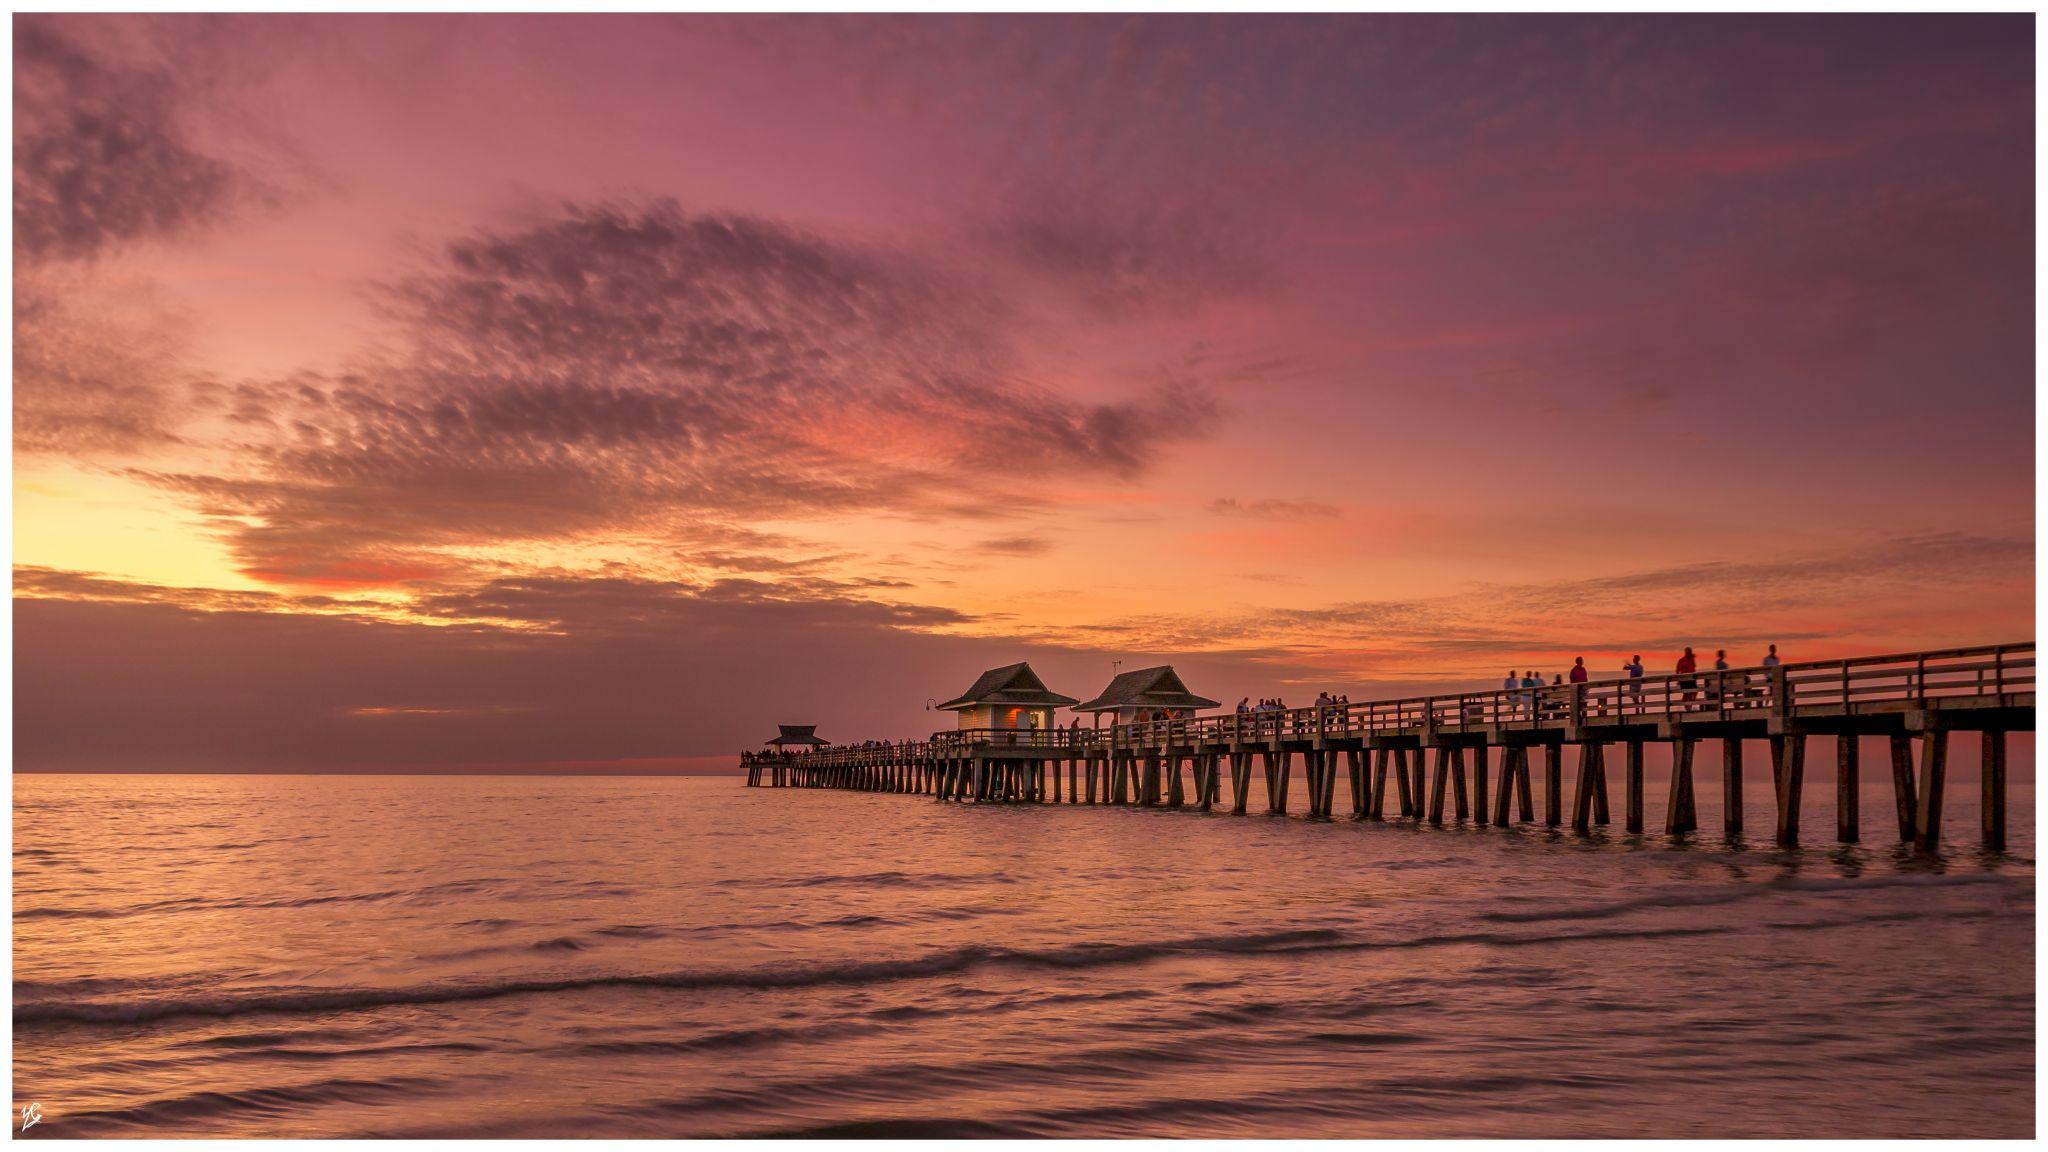 Naples Beach, USA